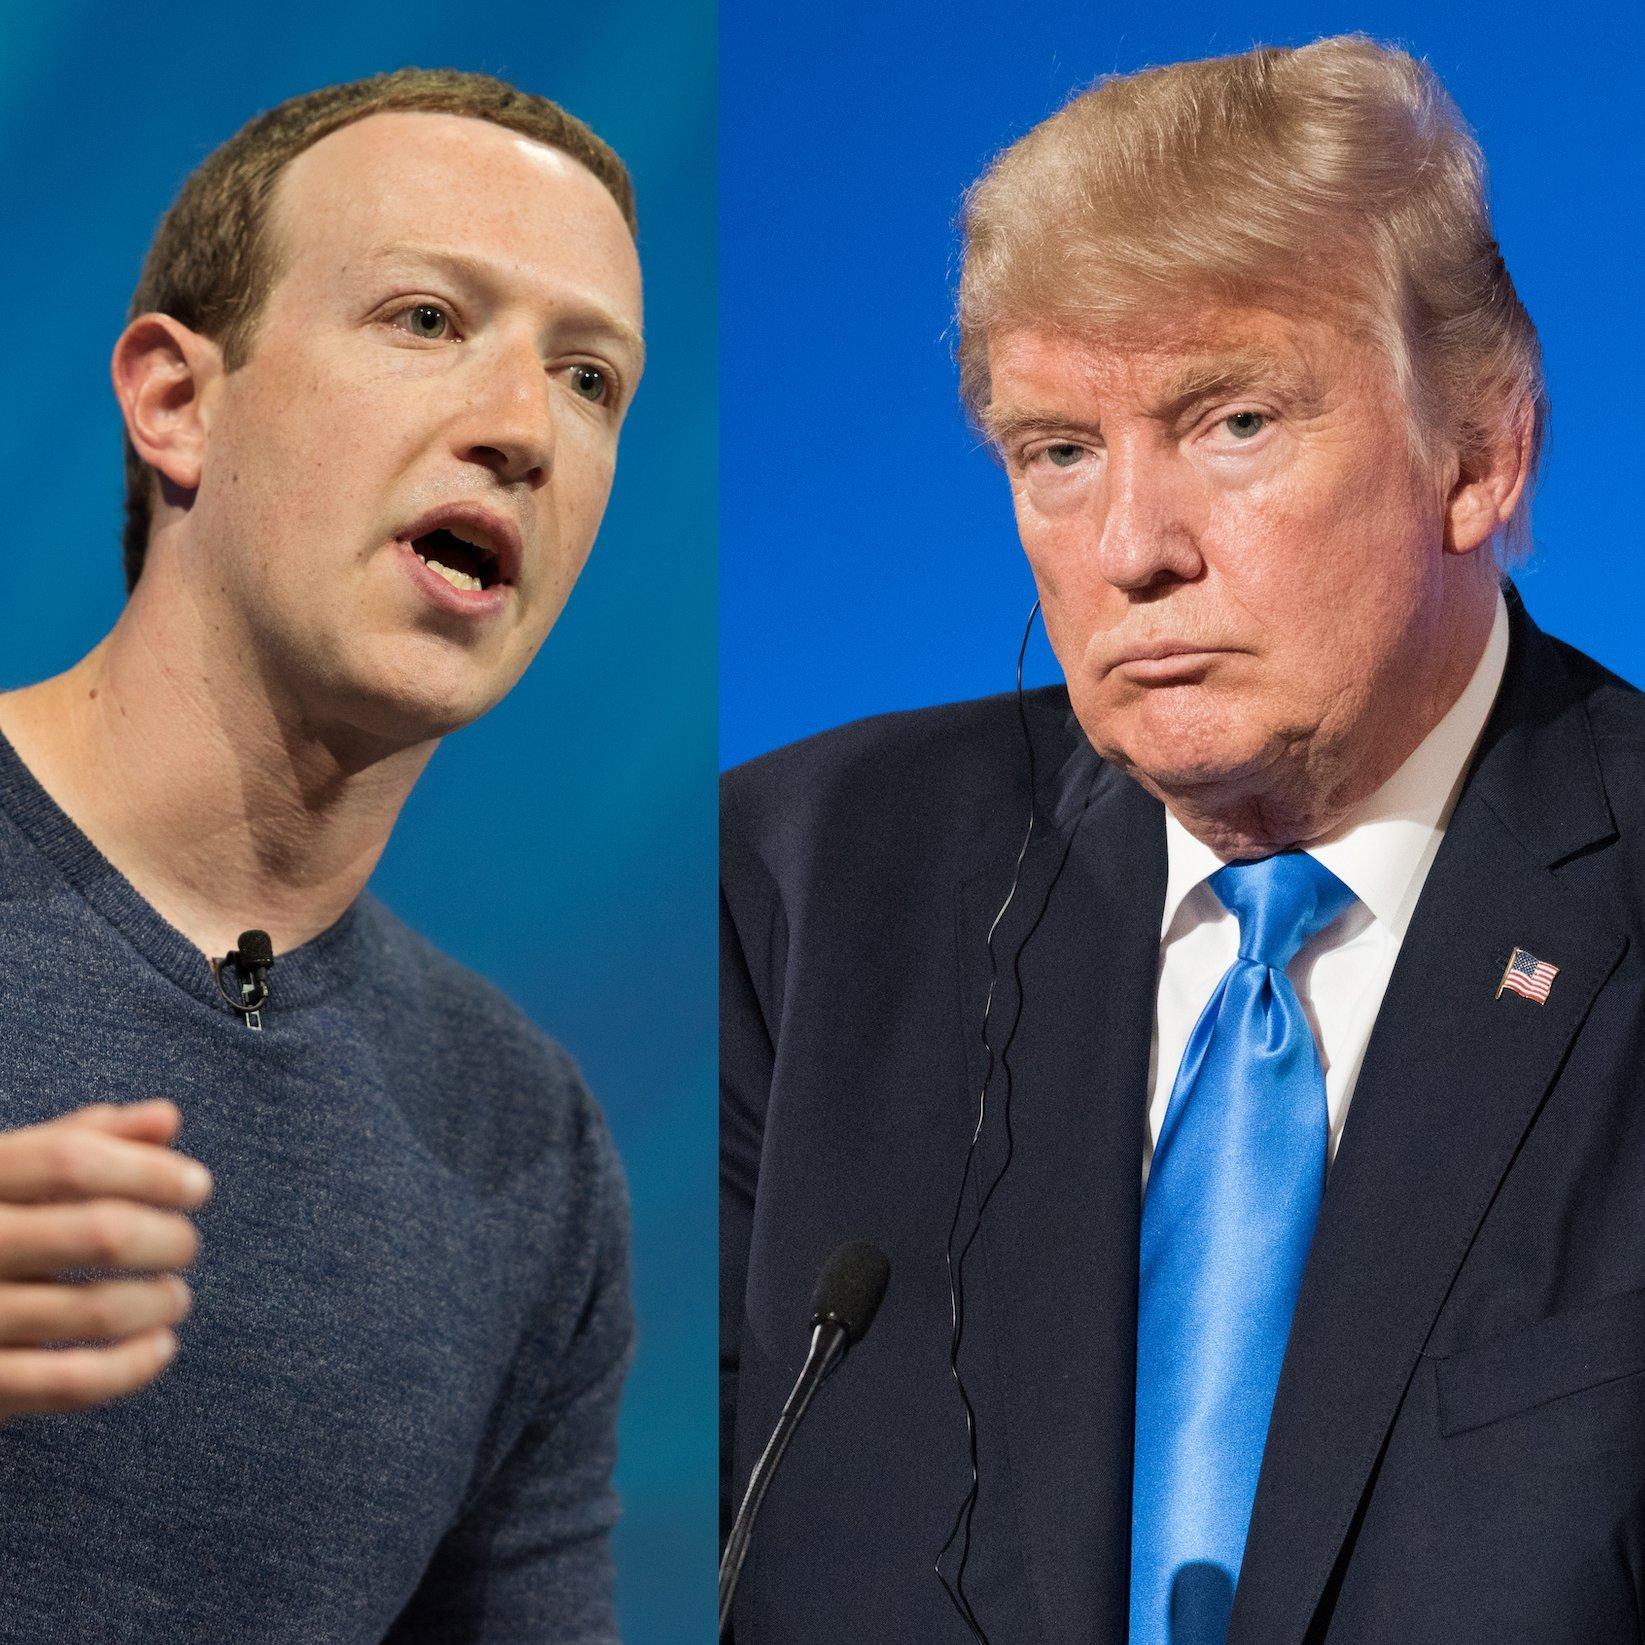 Listen: Trump Banned From Facebook Indefinitely